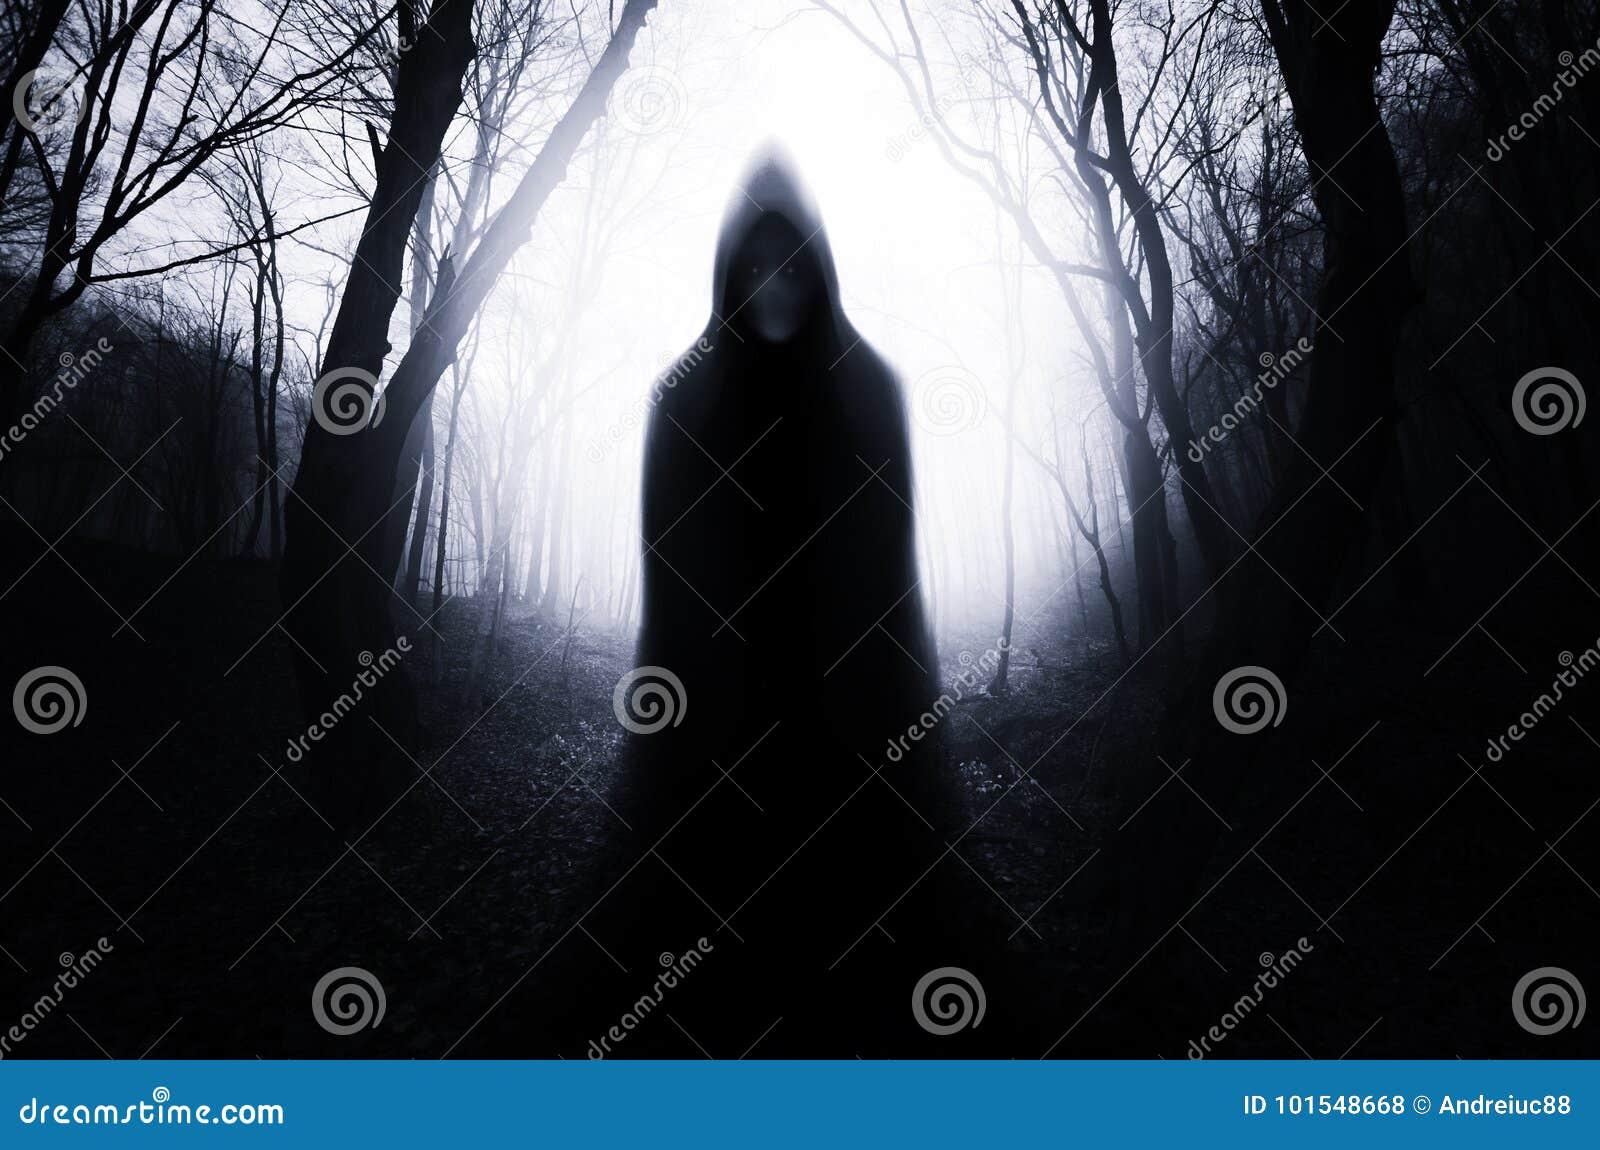 Ghost in dark haunted forest on Halloween